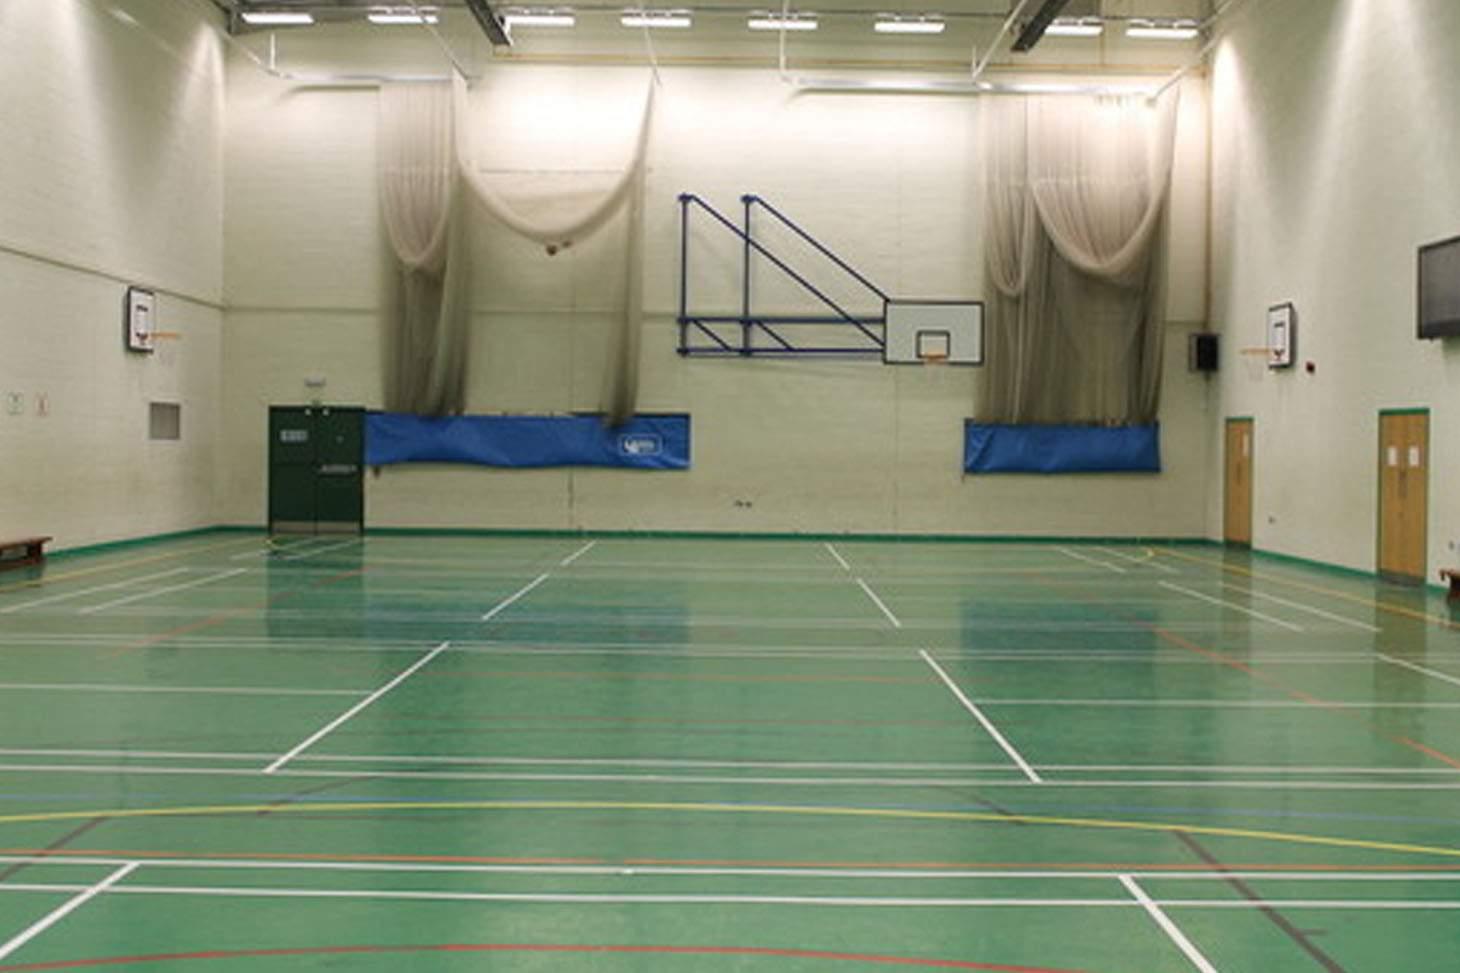 Tudor Grange Academy Solihull Indoor basketball court